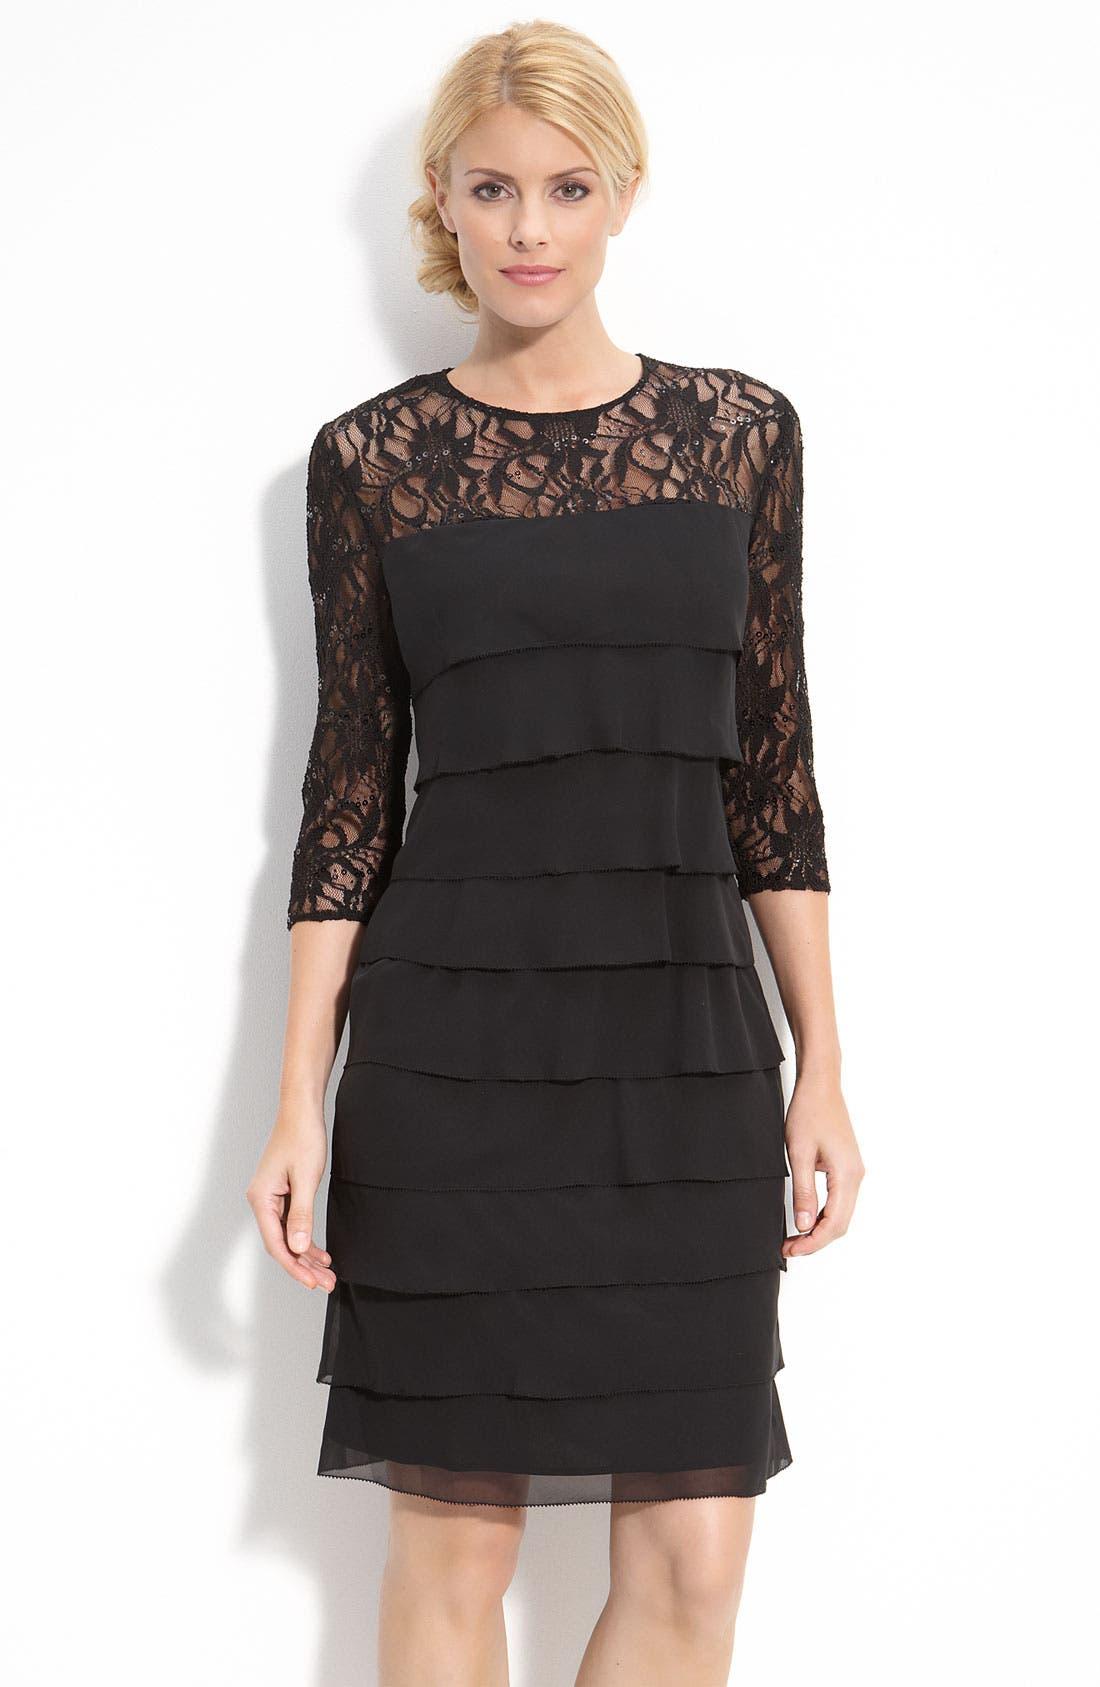 Alternate Image 1 Selected - Alex Evenings Tiered Chiffon & Lace Sheath Dress (Regular & Petite)